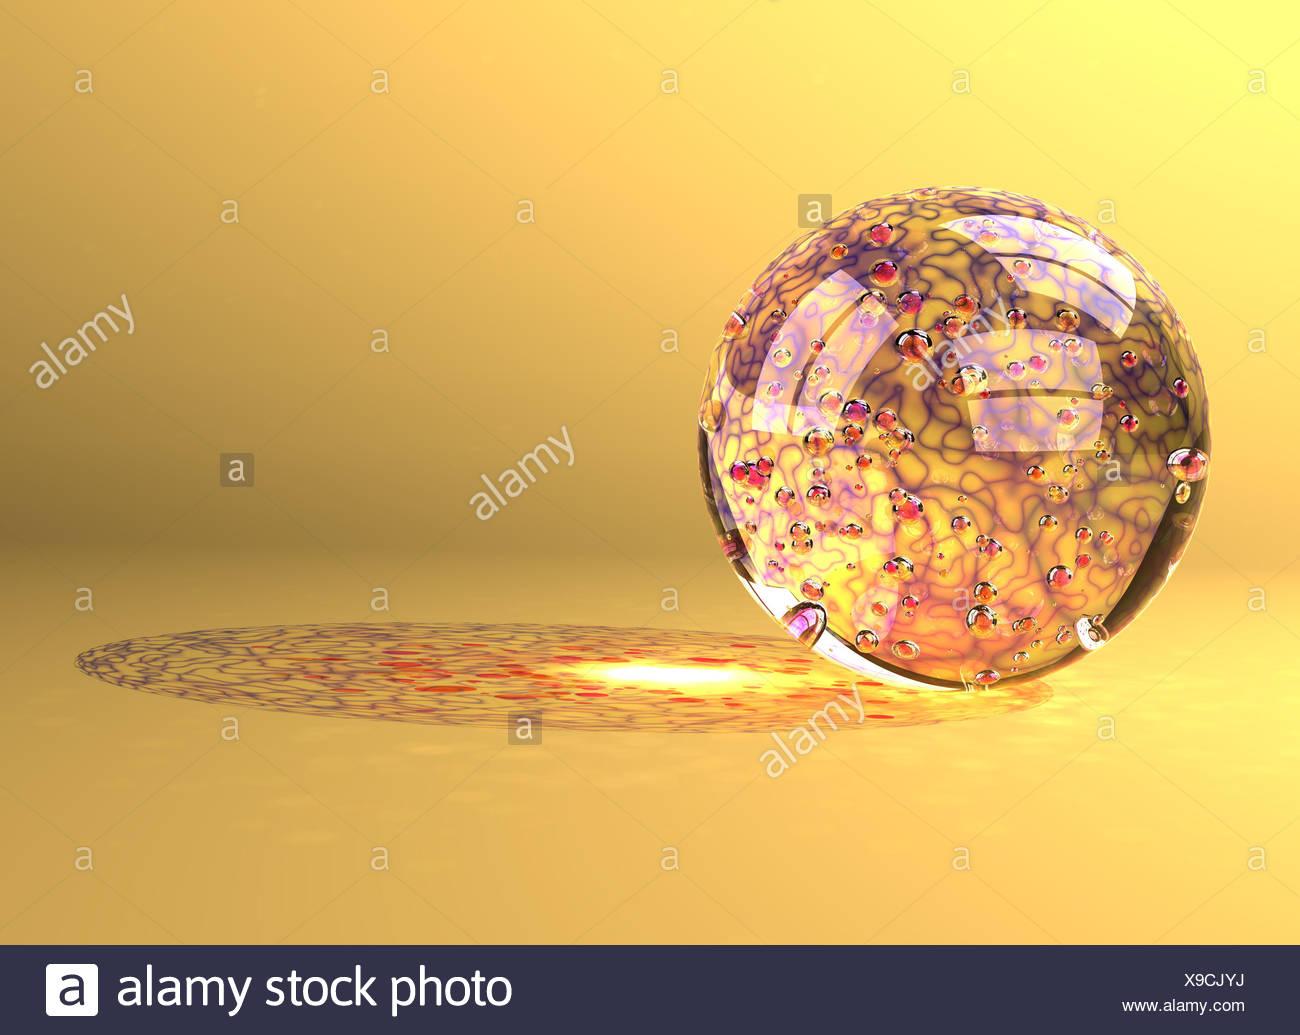 marble similar colors colours reflexion murmel glasmurmel bunt lichtreflexe - Stock Image